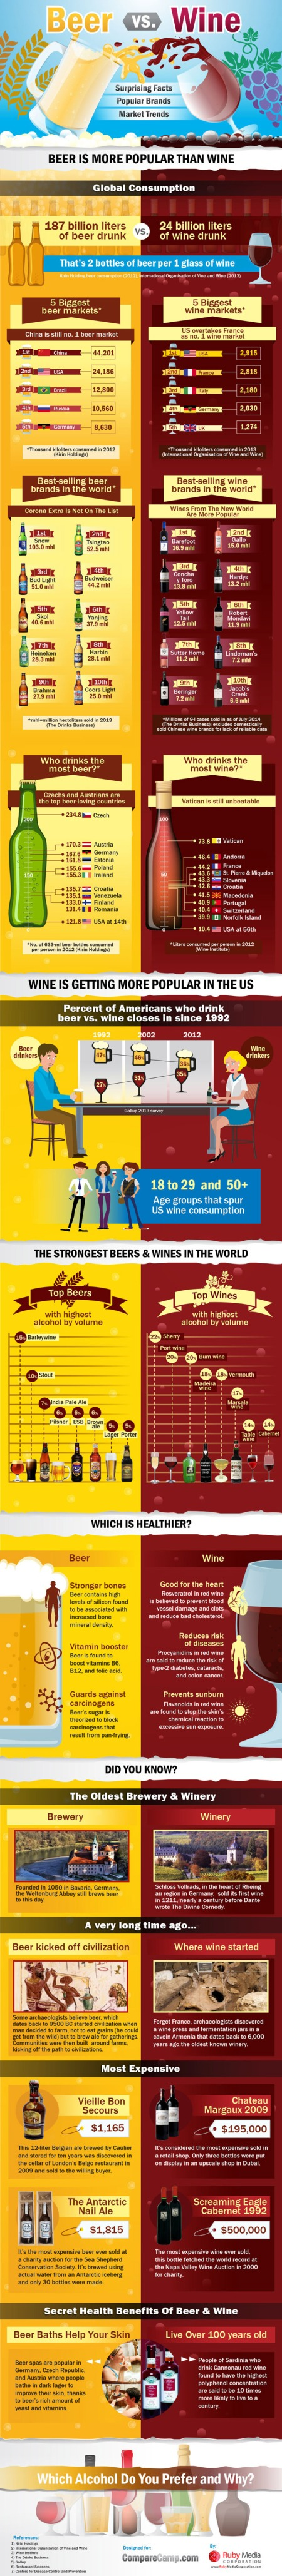 8-beer-wine-infographic-Franklin-Liquors